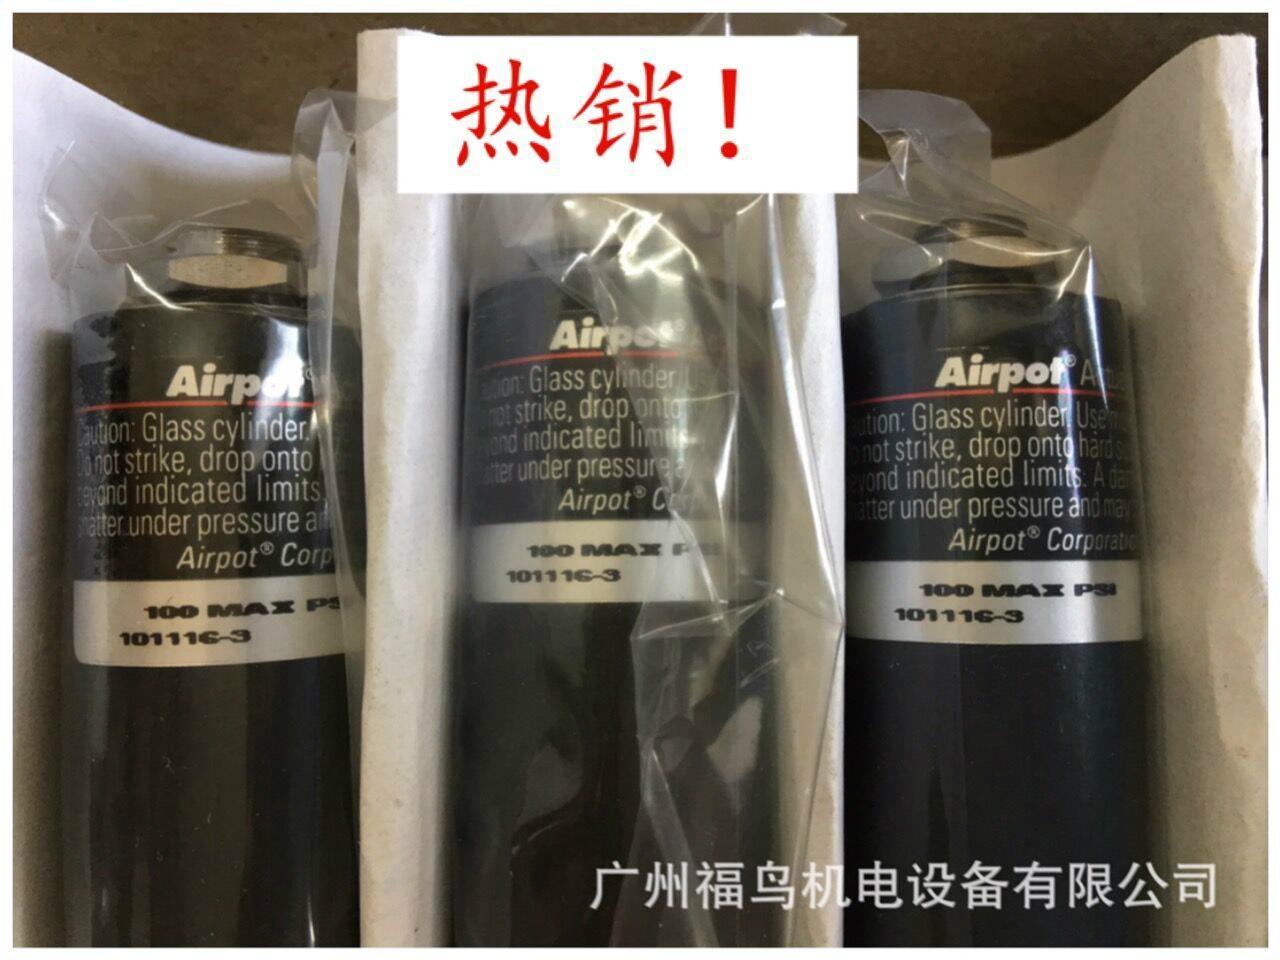 AIRPOT玻璃气缸, 阻尼器, 缓冲器, 型号: 101116-3